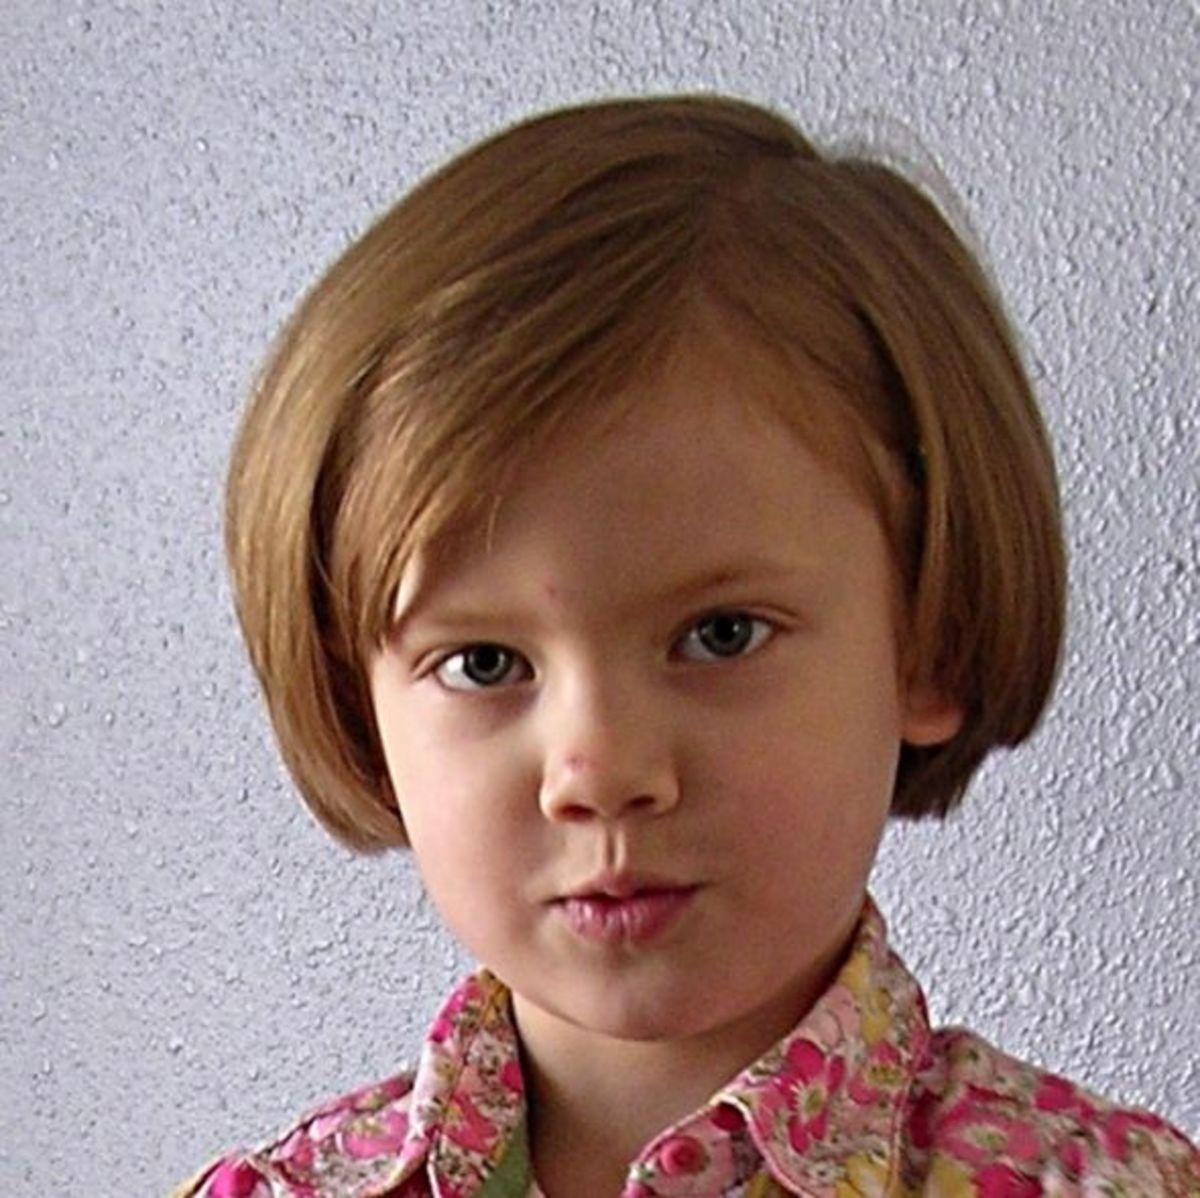 Haircuts for Girls